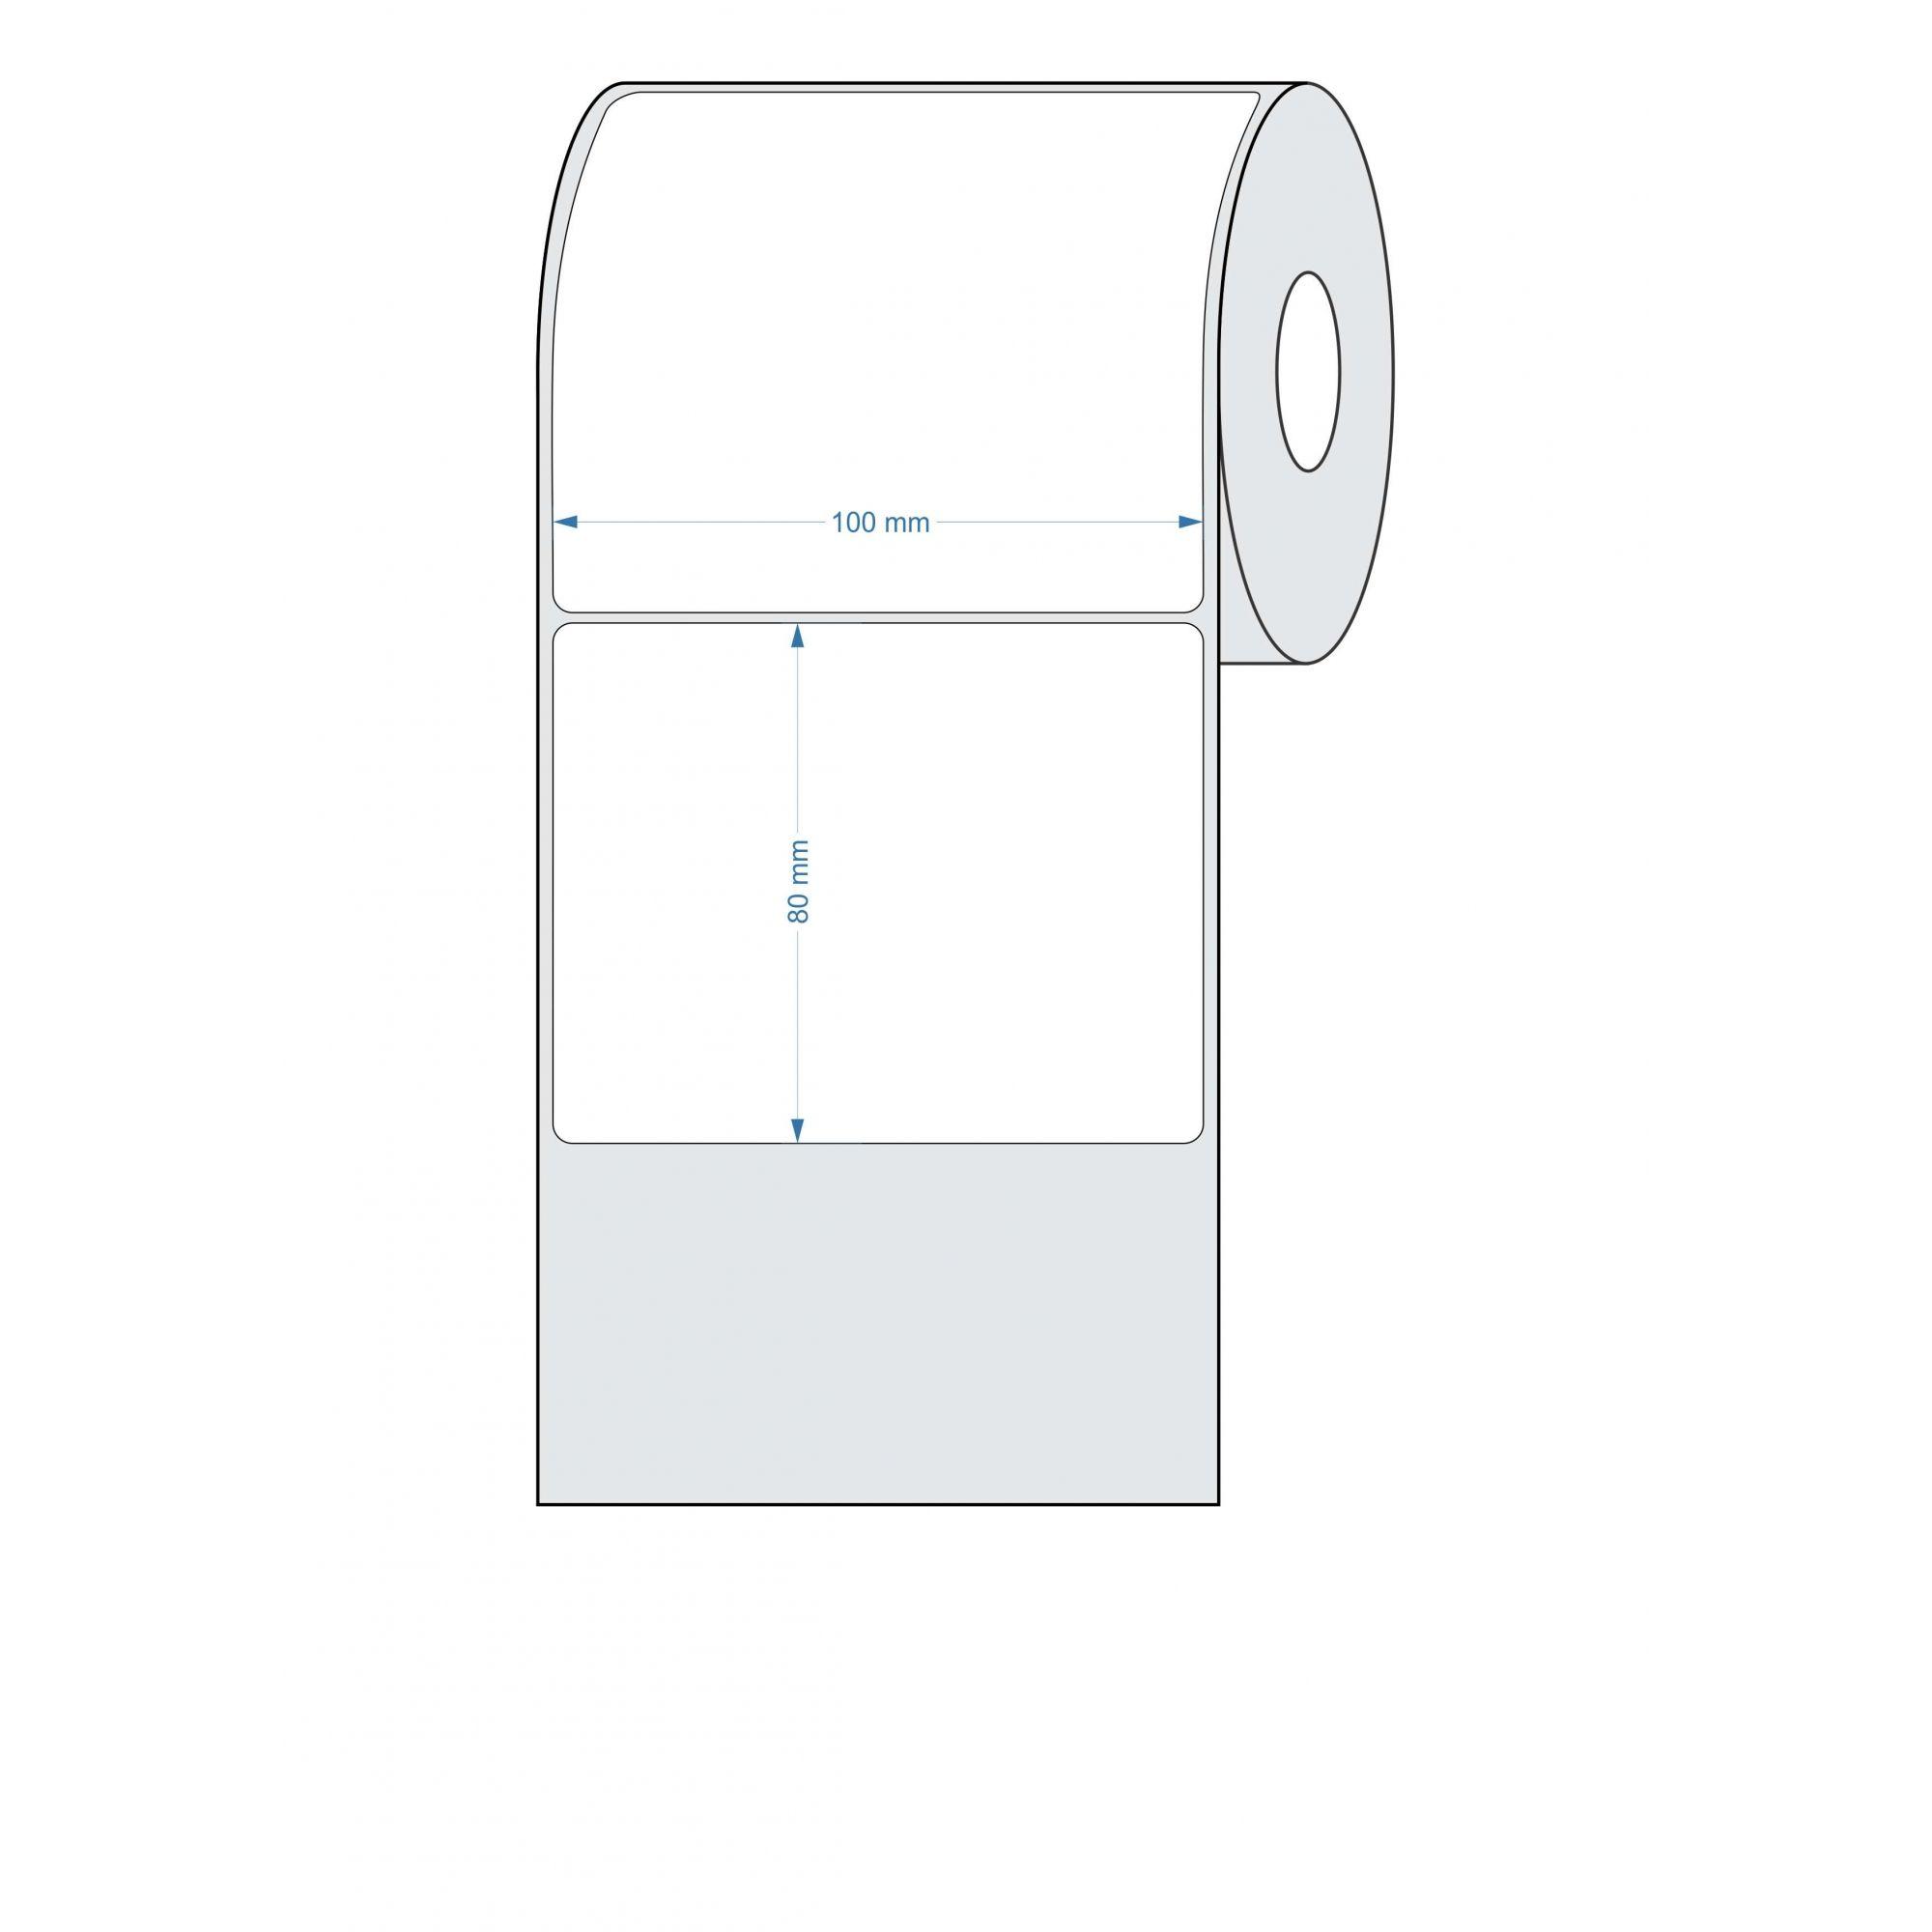 Etiquetas Adesivas 100x80 mm BOPP FOSCO 32 Metros